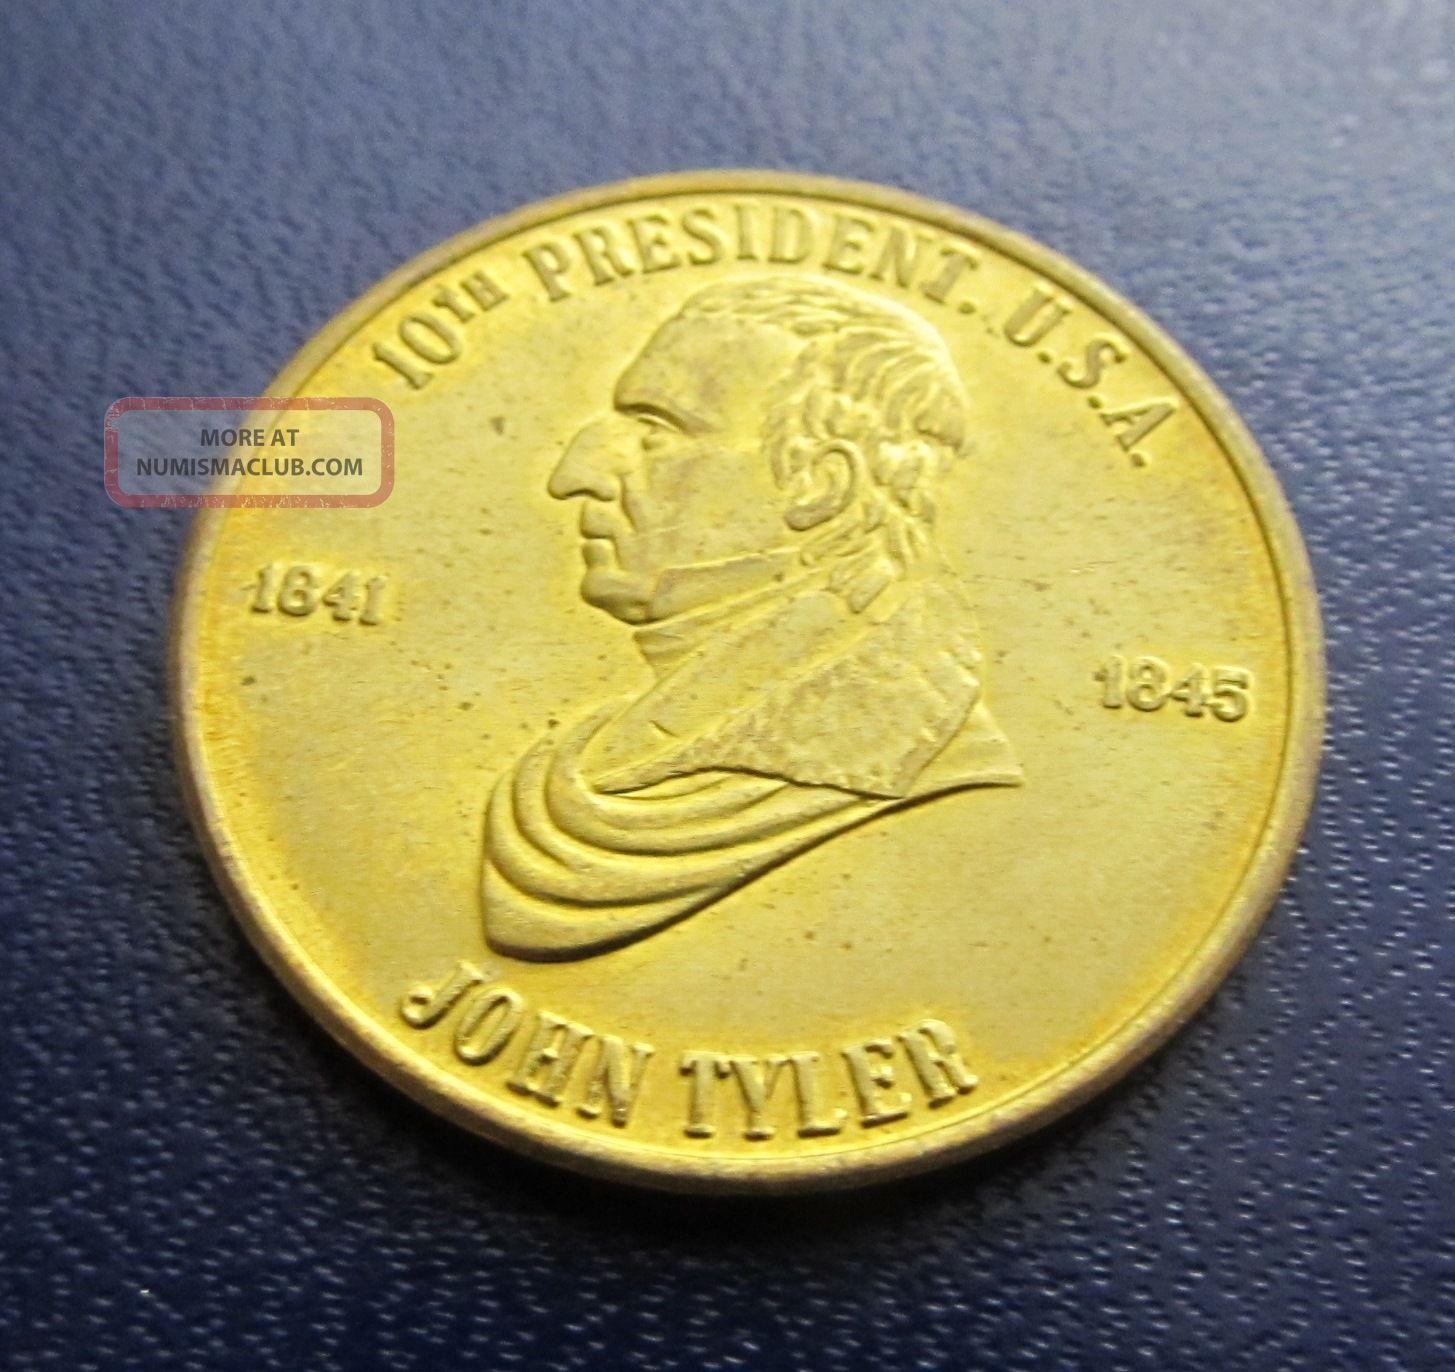 John Tyler 10th Us President 1841 - 1845 Accidential President Coin Medal Token 3 Exonumia photo